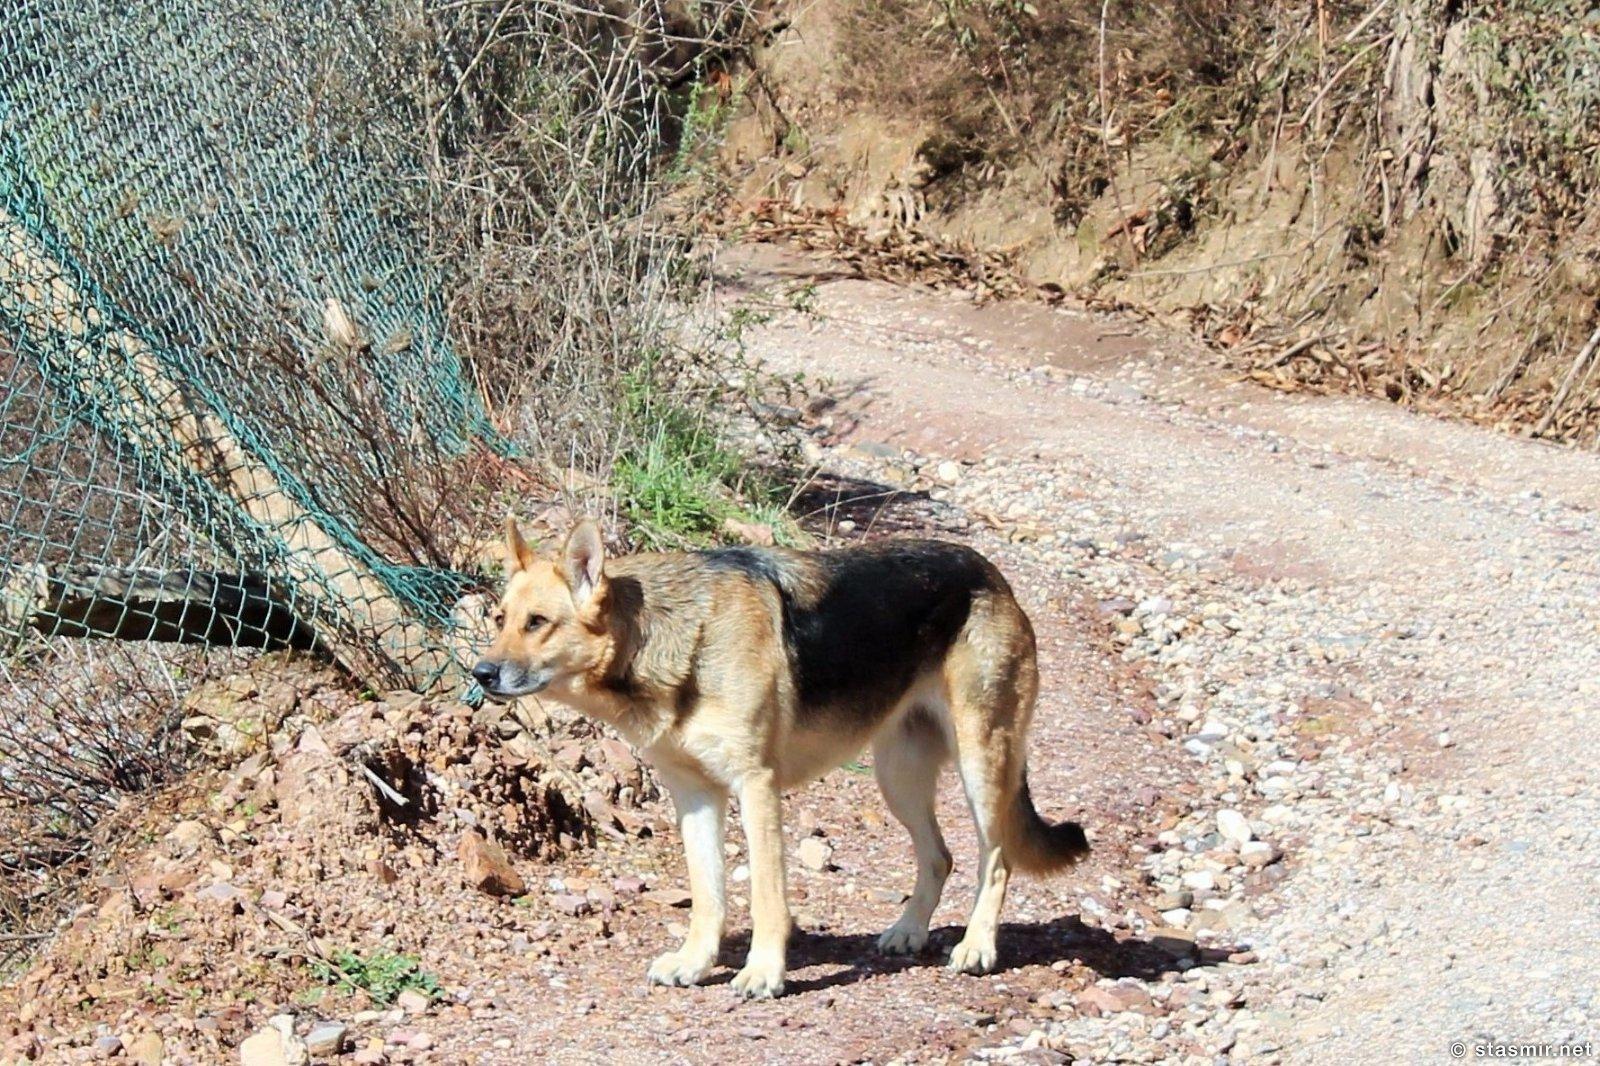 собака на пешей тропе вокруг Мармелете, Альгарве, фото Стасмир, photo Stasmir, Percurso Pedestre de Marmelete, Моншик, Мармелете